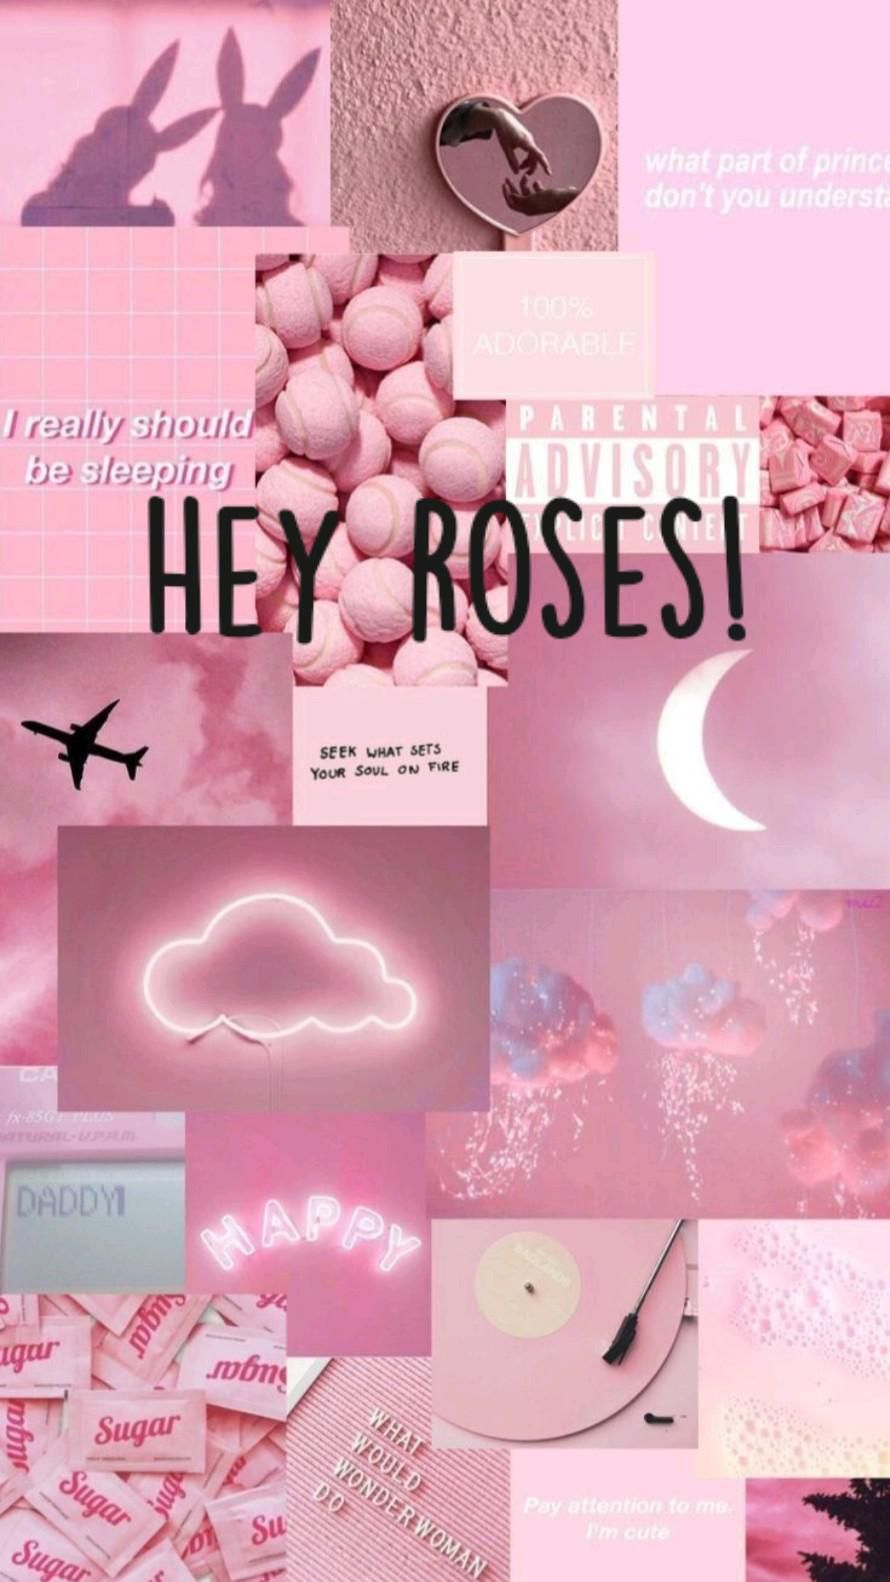 Hey roses!